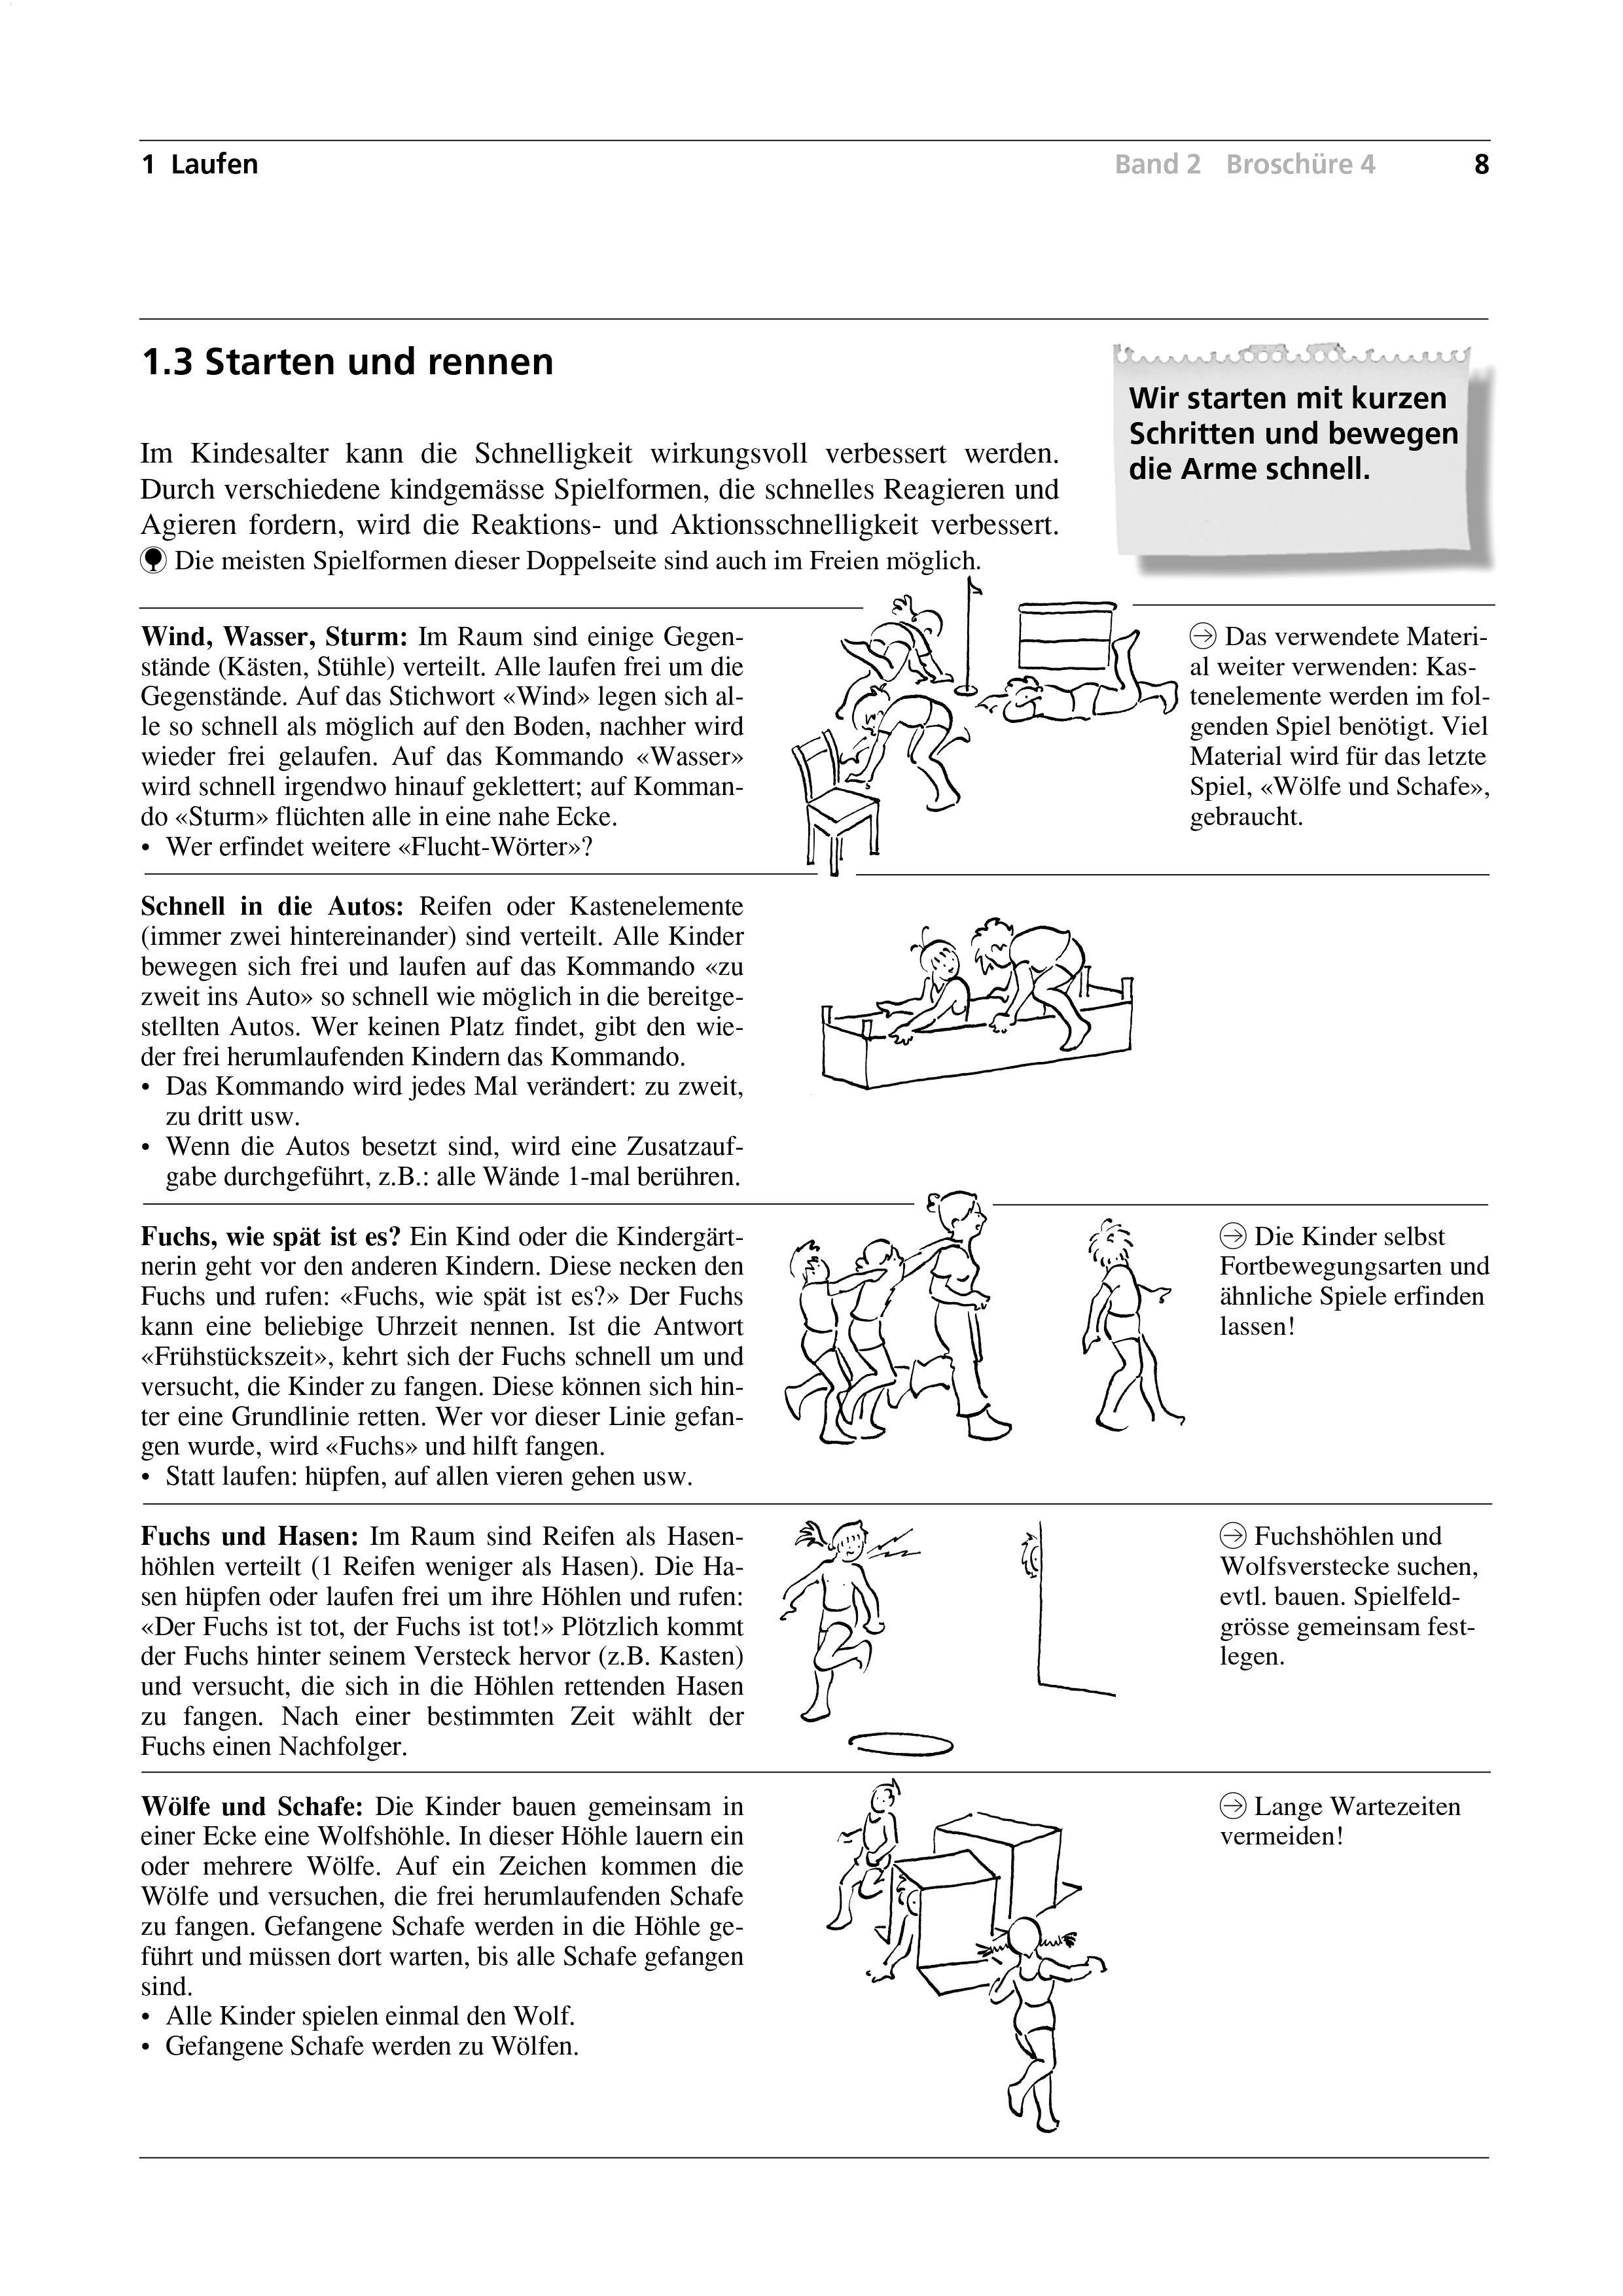 Preview image for LOM object Starten und rennen